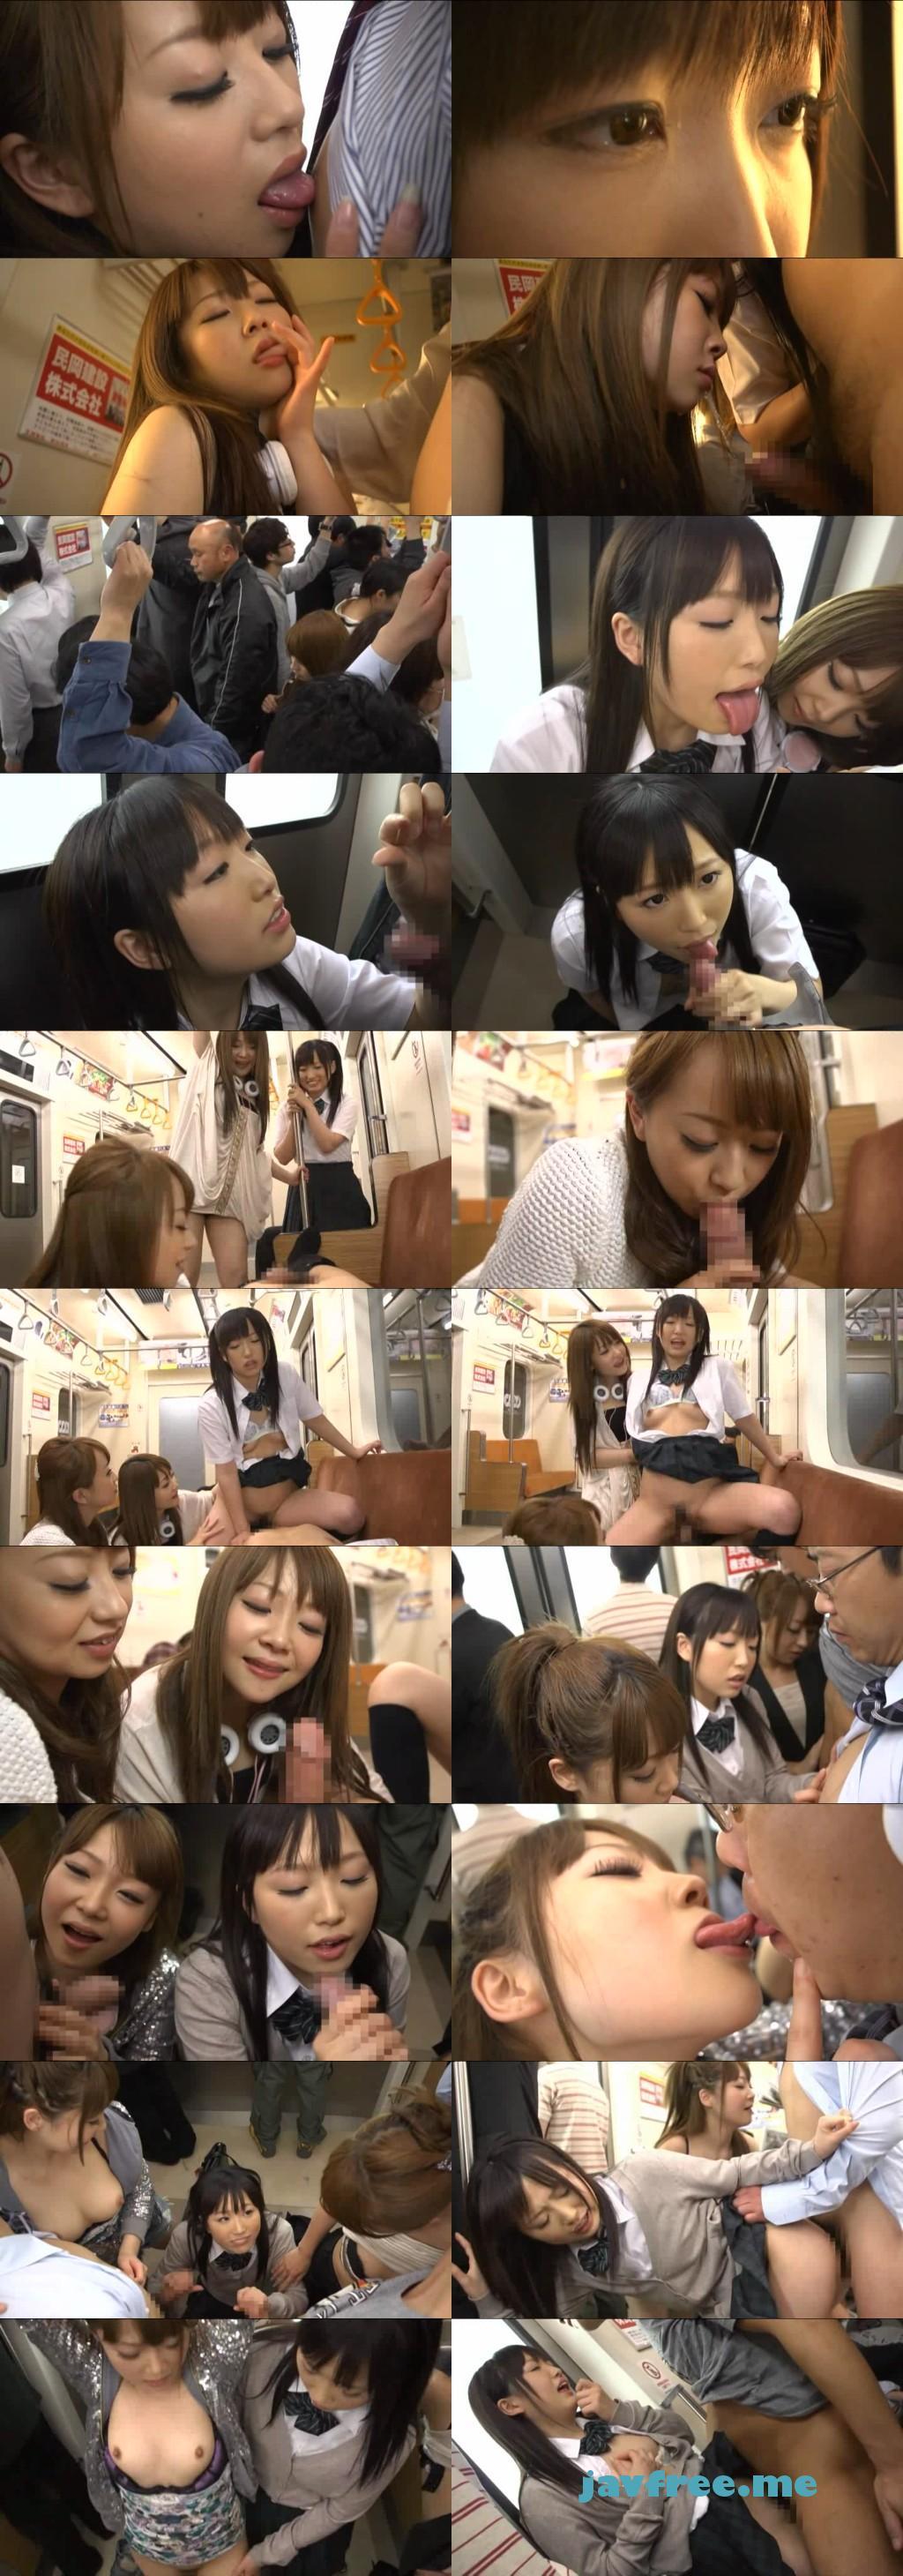 [SDMT-766] 電車内で低身長の痴女たちに立ったまま乳首を舐められながらイカされる - image SDMT766 on https://javfree.me